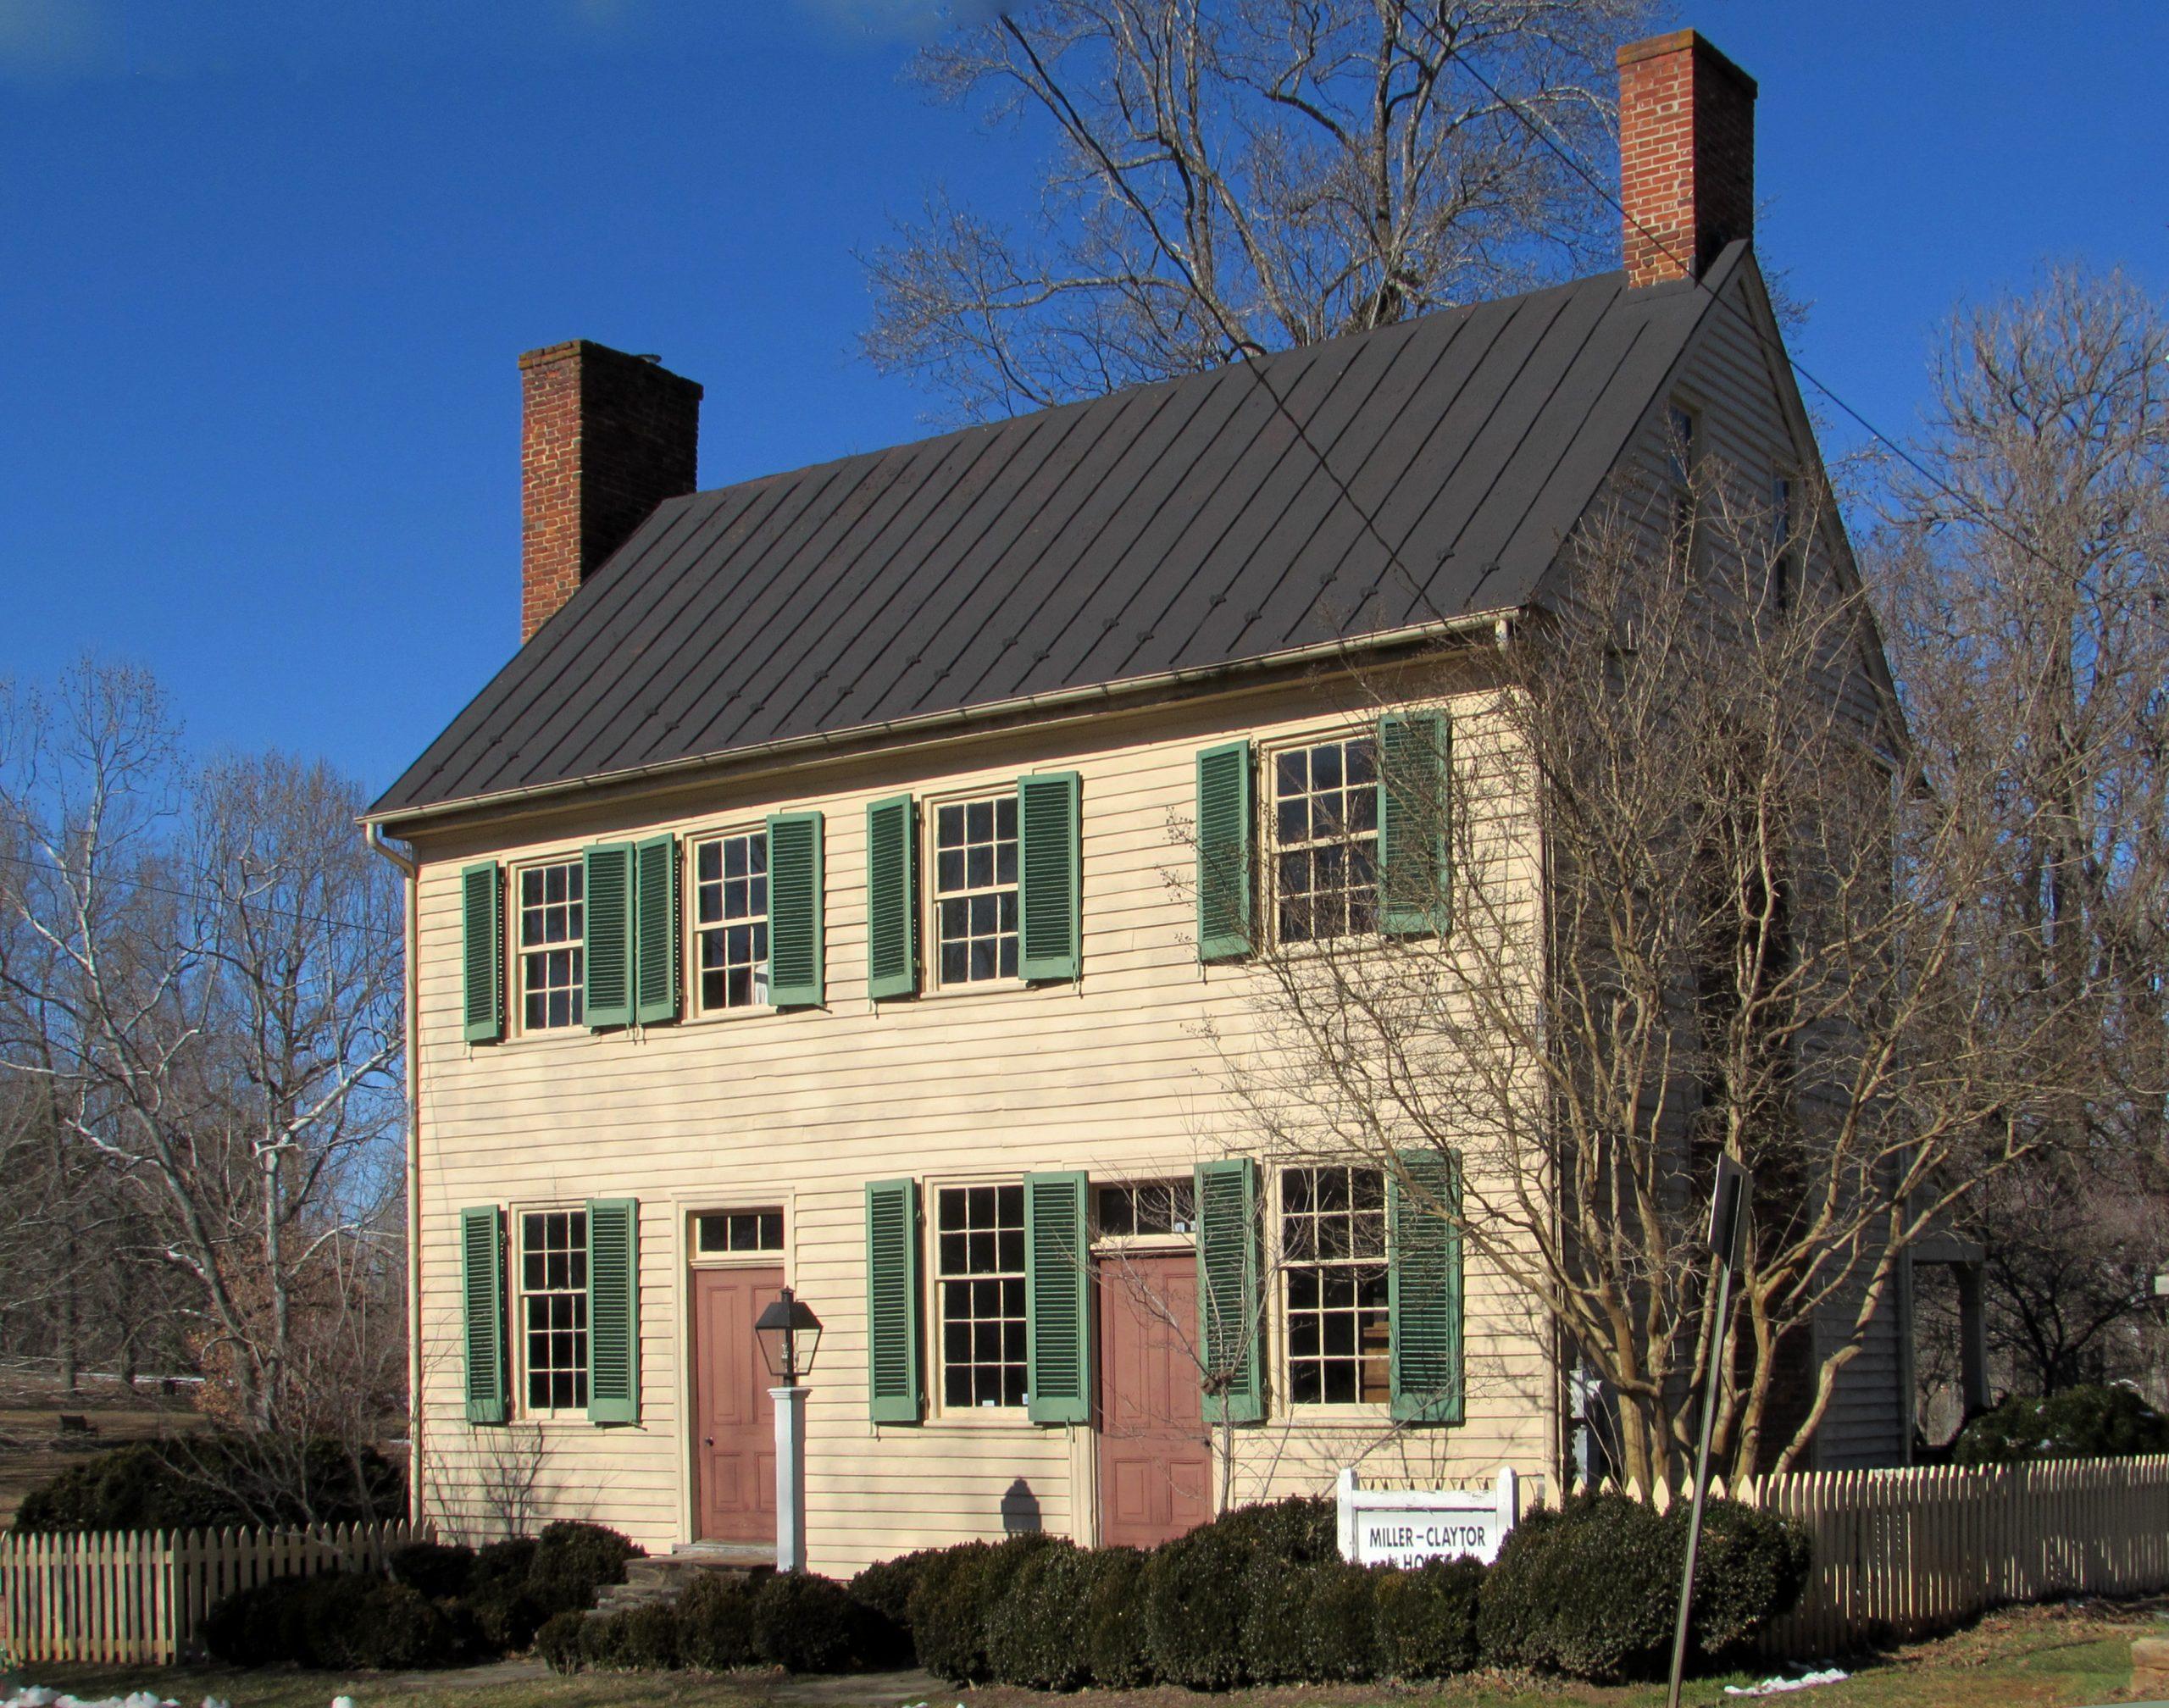 Miller-Claytor House